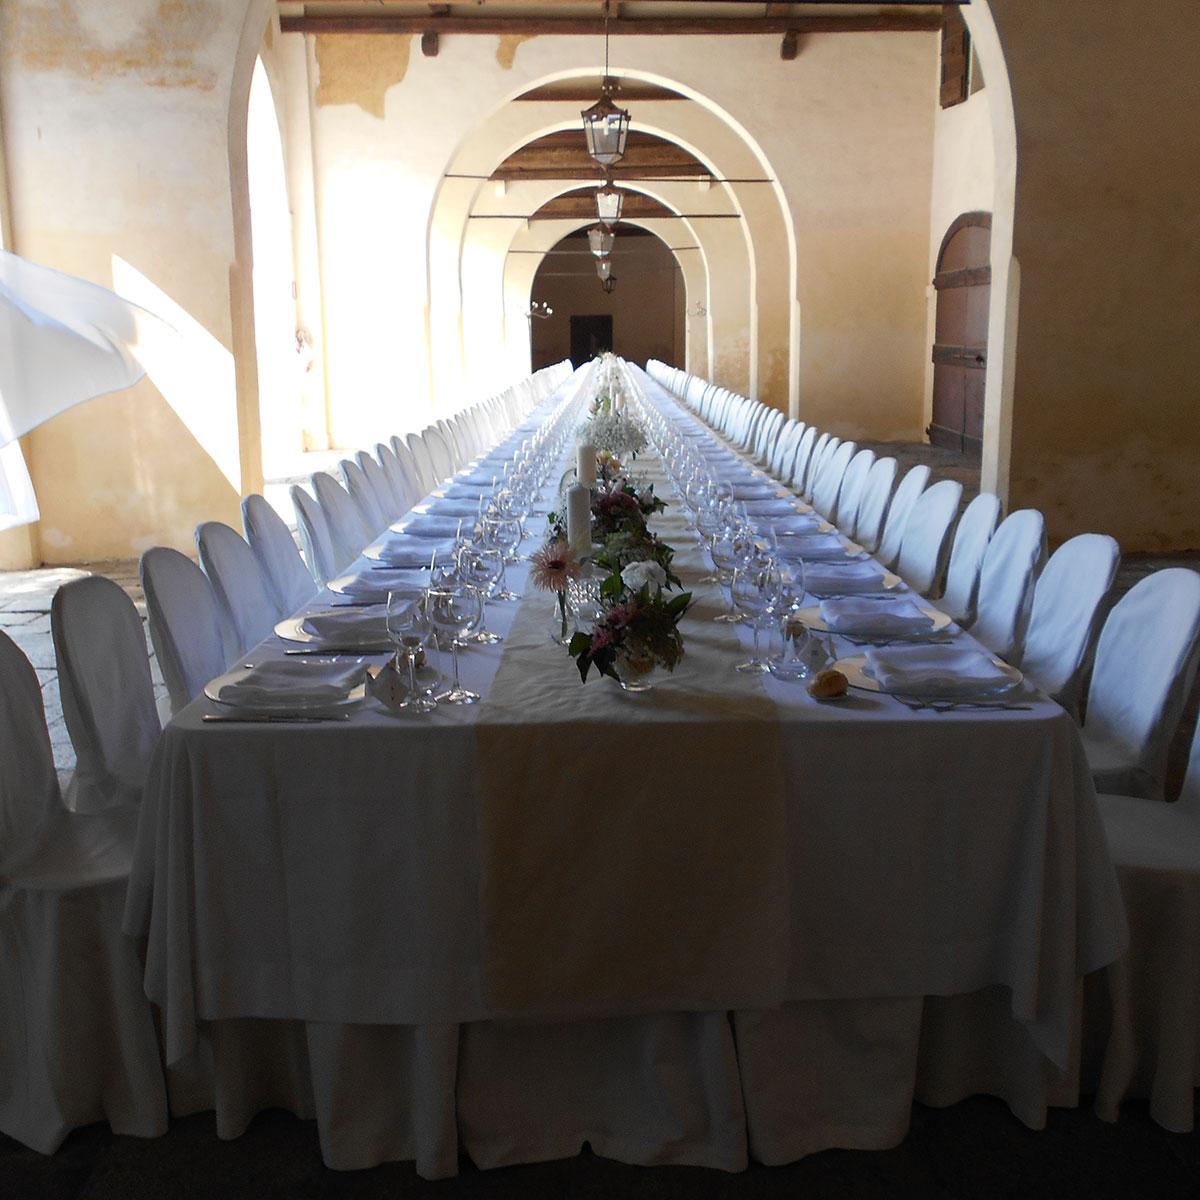 Pranzi per matrimoni | Negriricevimenti.com